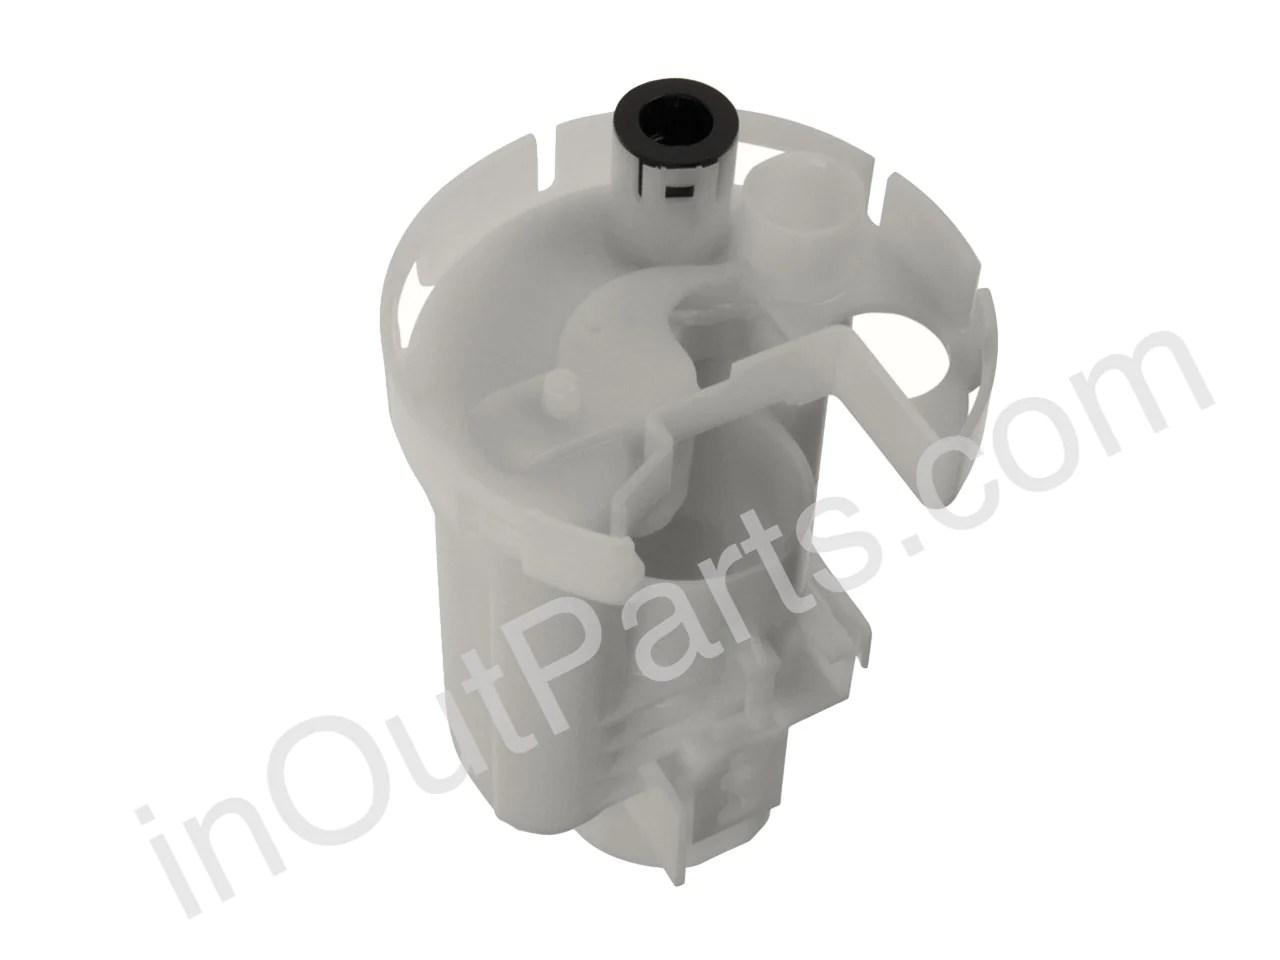 small resolution of fuel filter fits toyota alphard corolla camry harrier hailanderfuel filter fits toyota